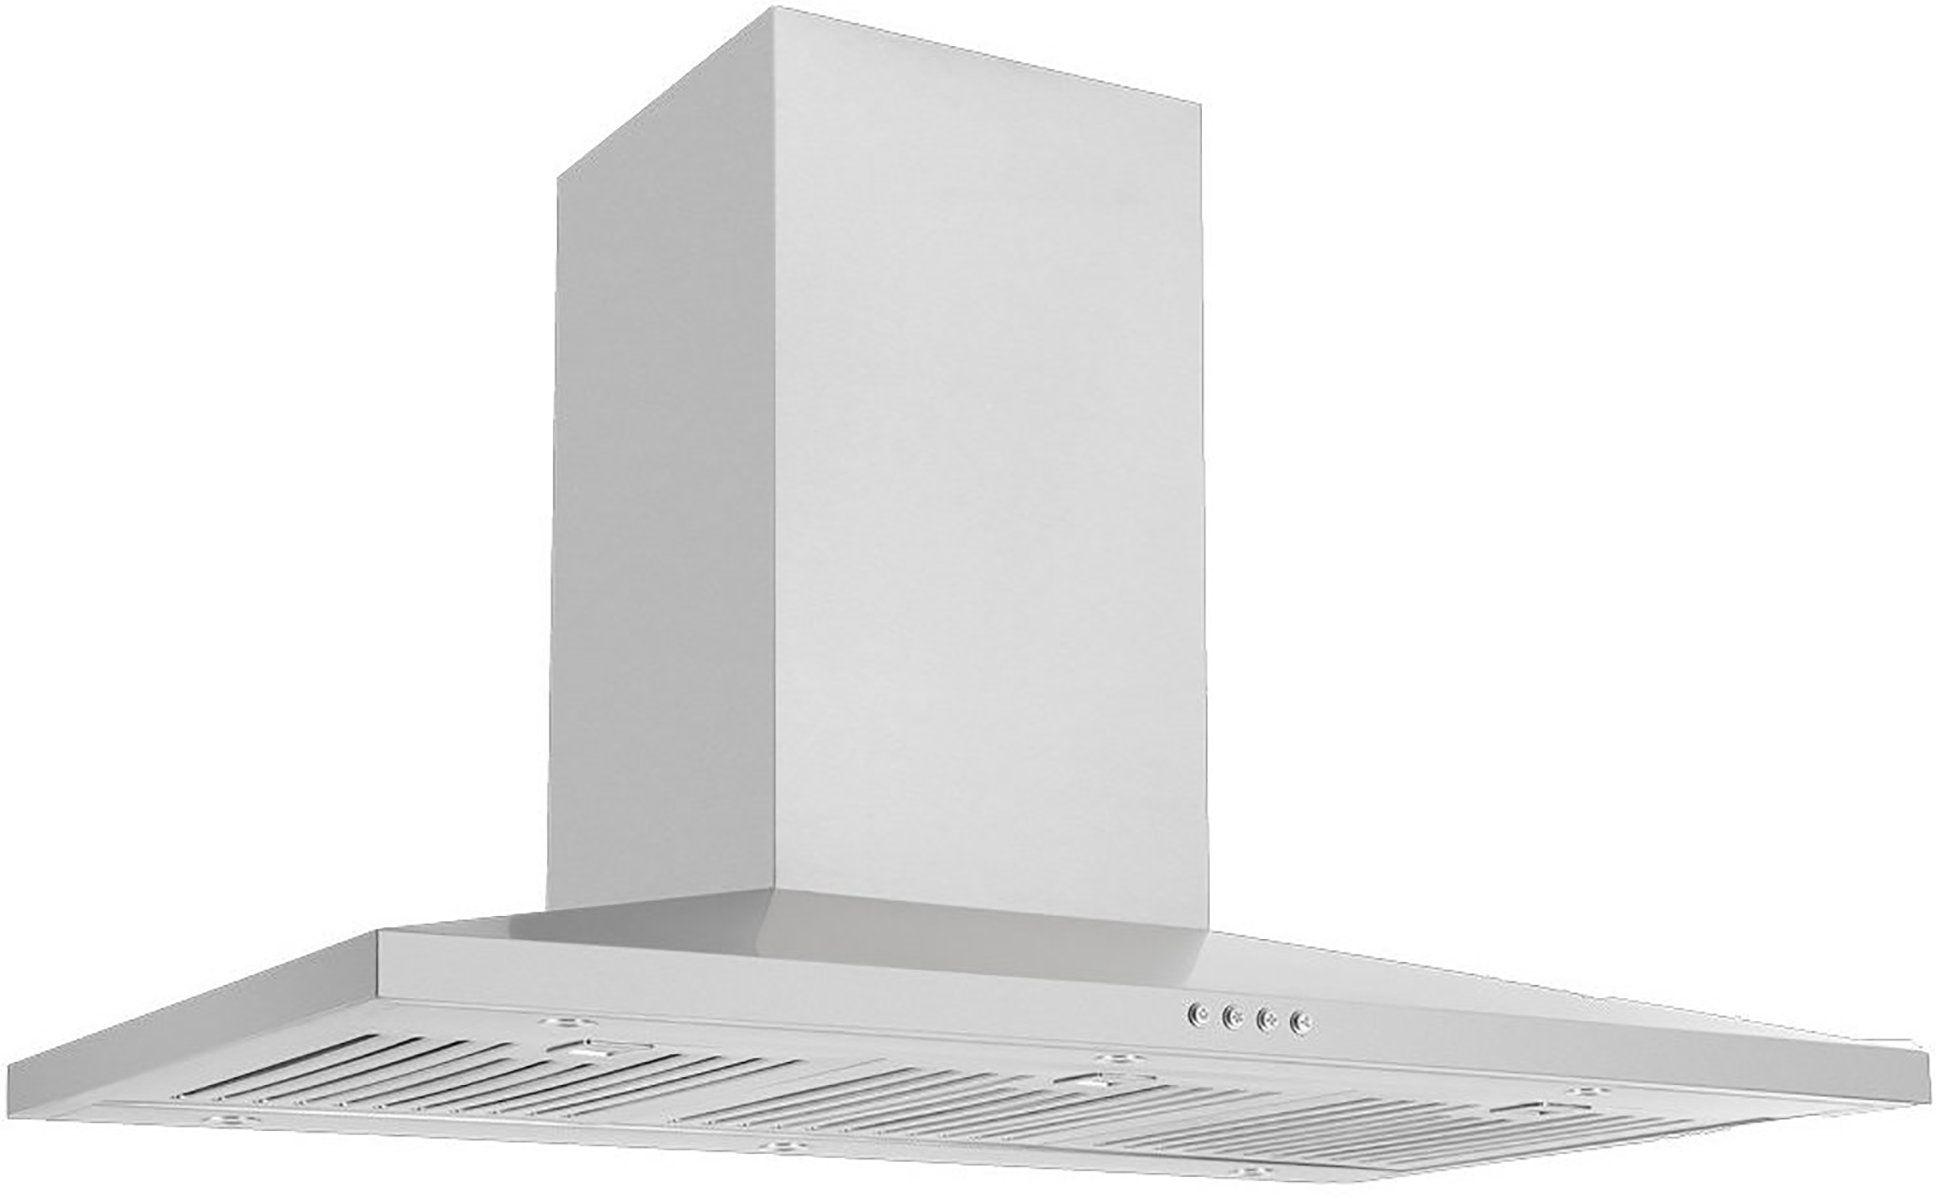 Emilia Ck90scf 90cm Canopy Rangehood Appliances Online Canopy Rangehood Appliances Online Canopy